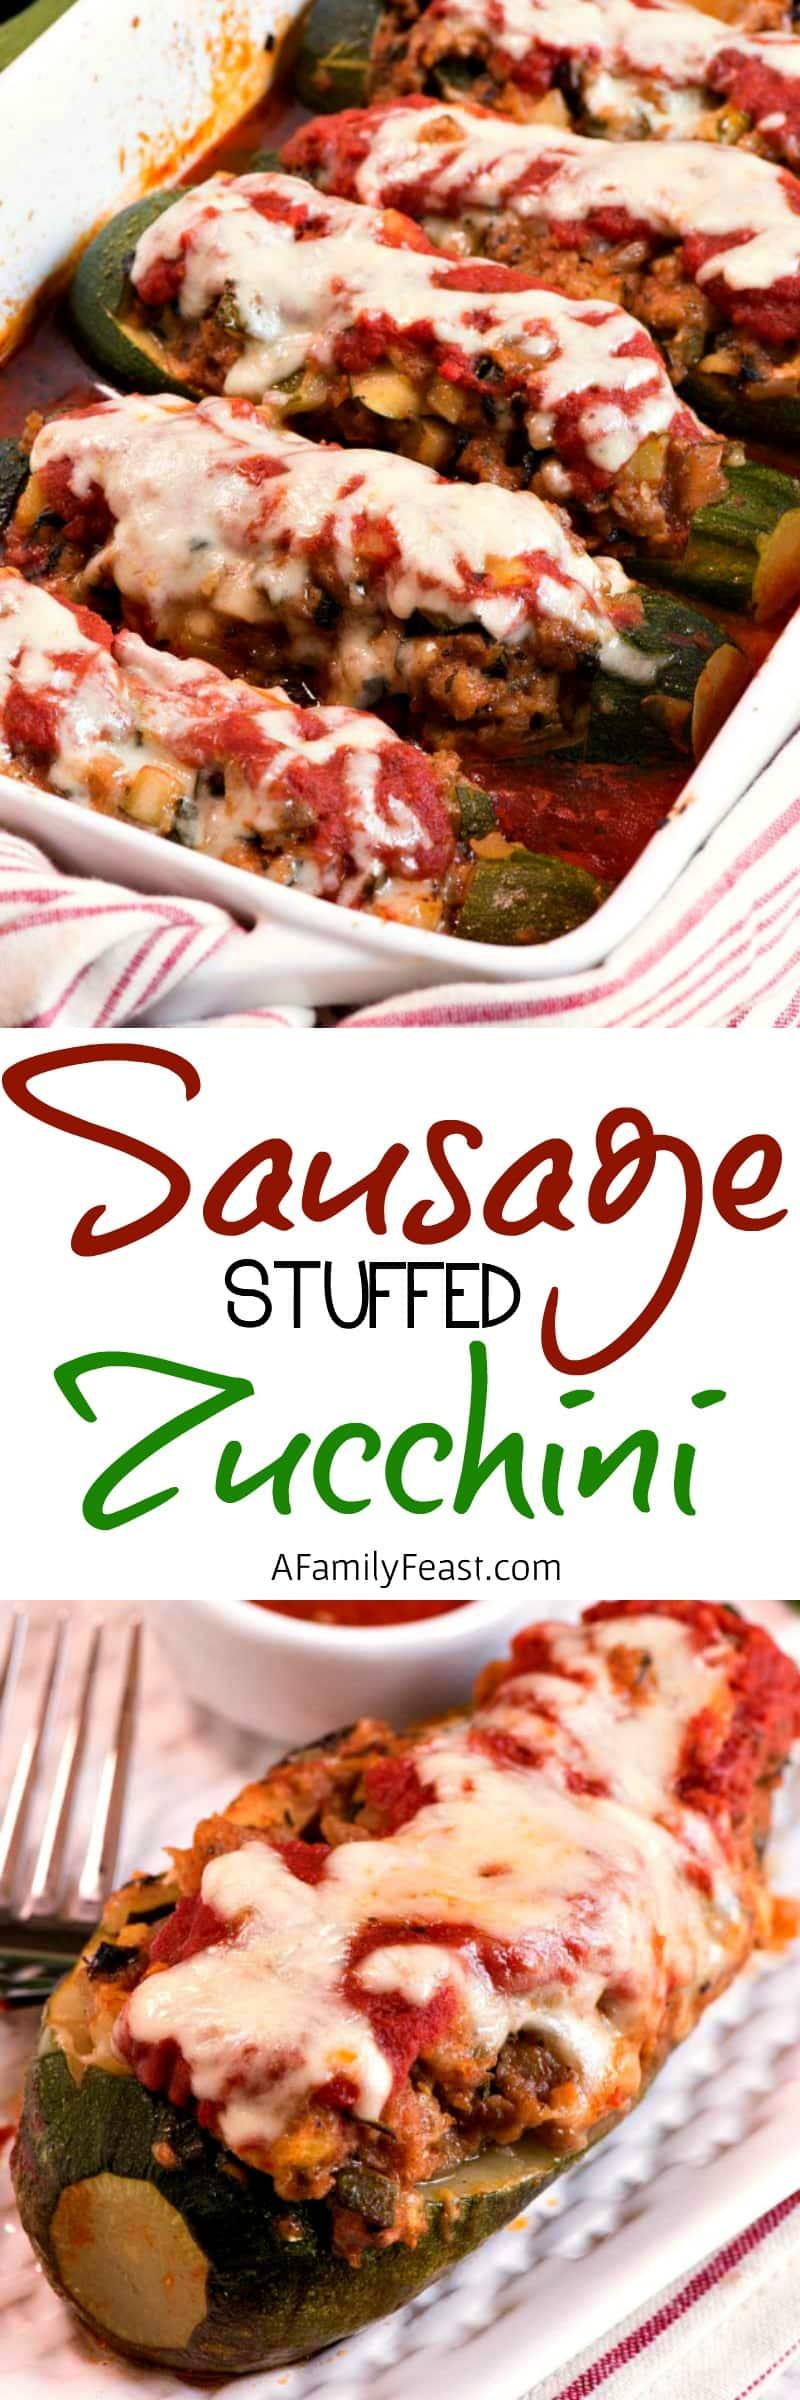 Make this delicious Sausage Stuffed Zucchini recipe with fresh garden zucchini!